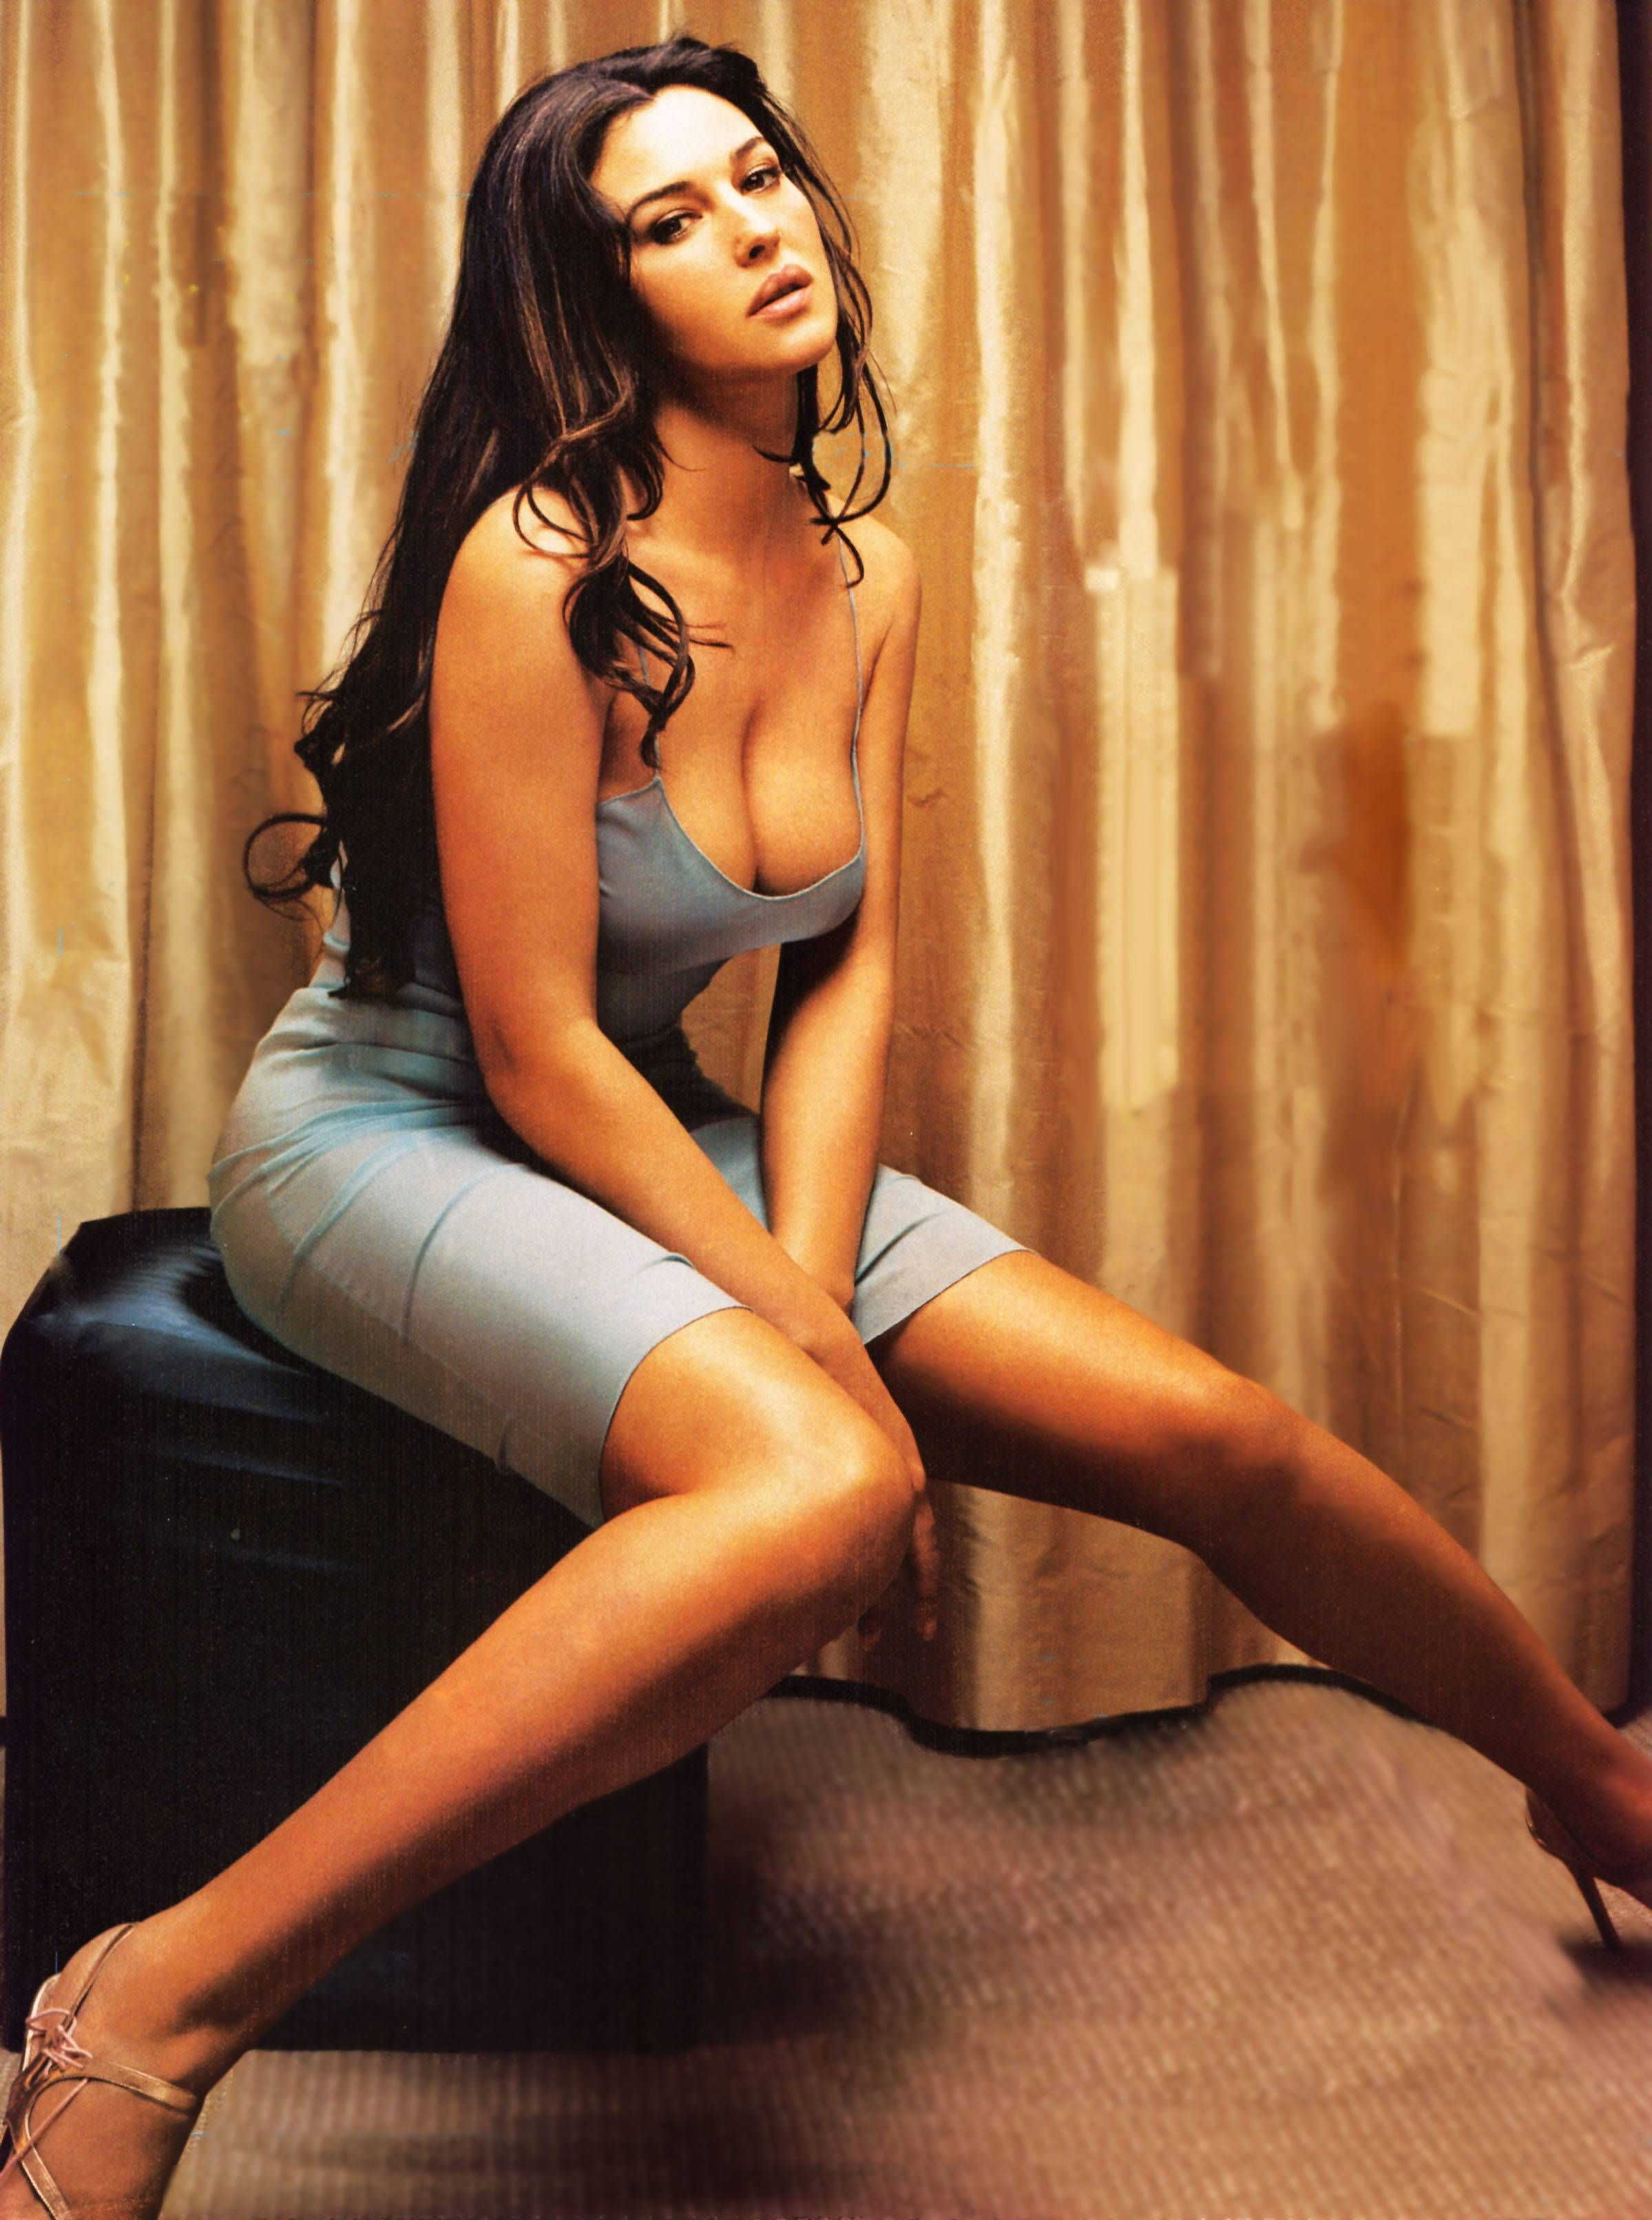 Monica Bellucci Gentlemanboners Hot Sexy Photooftheday Model Beautiful Wcw